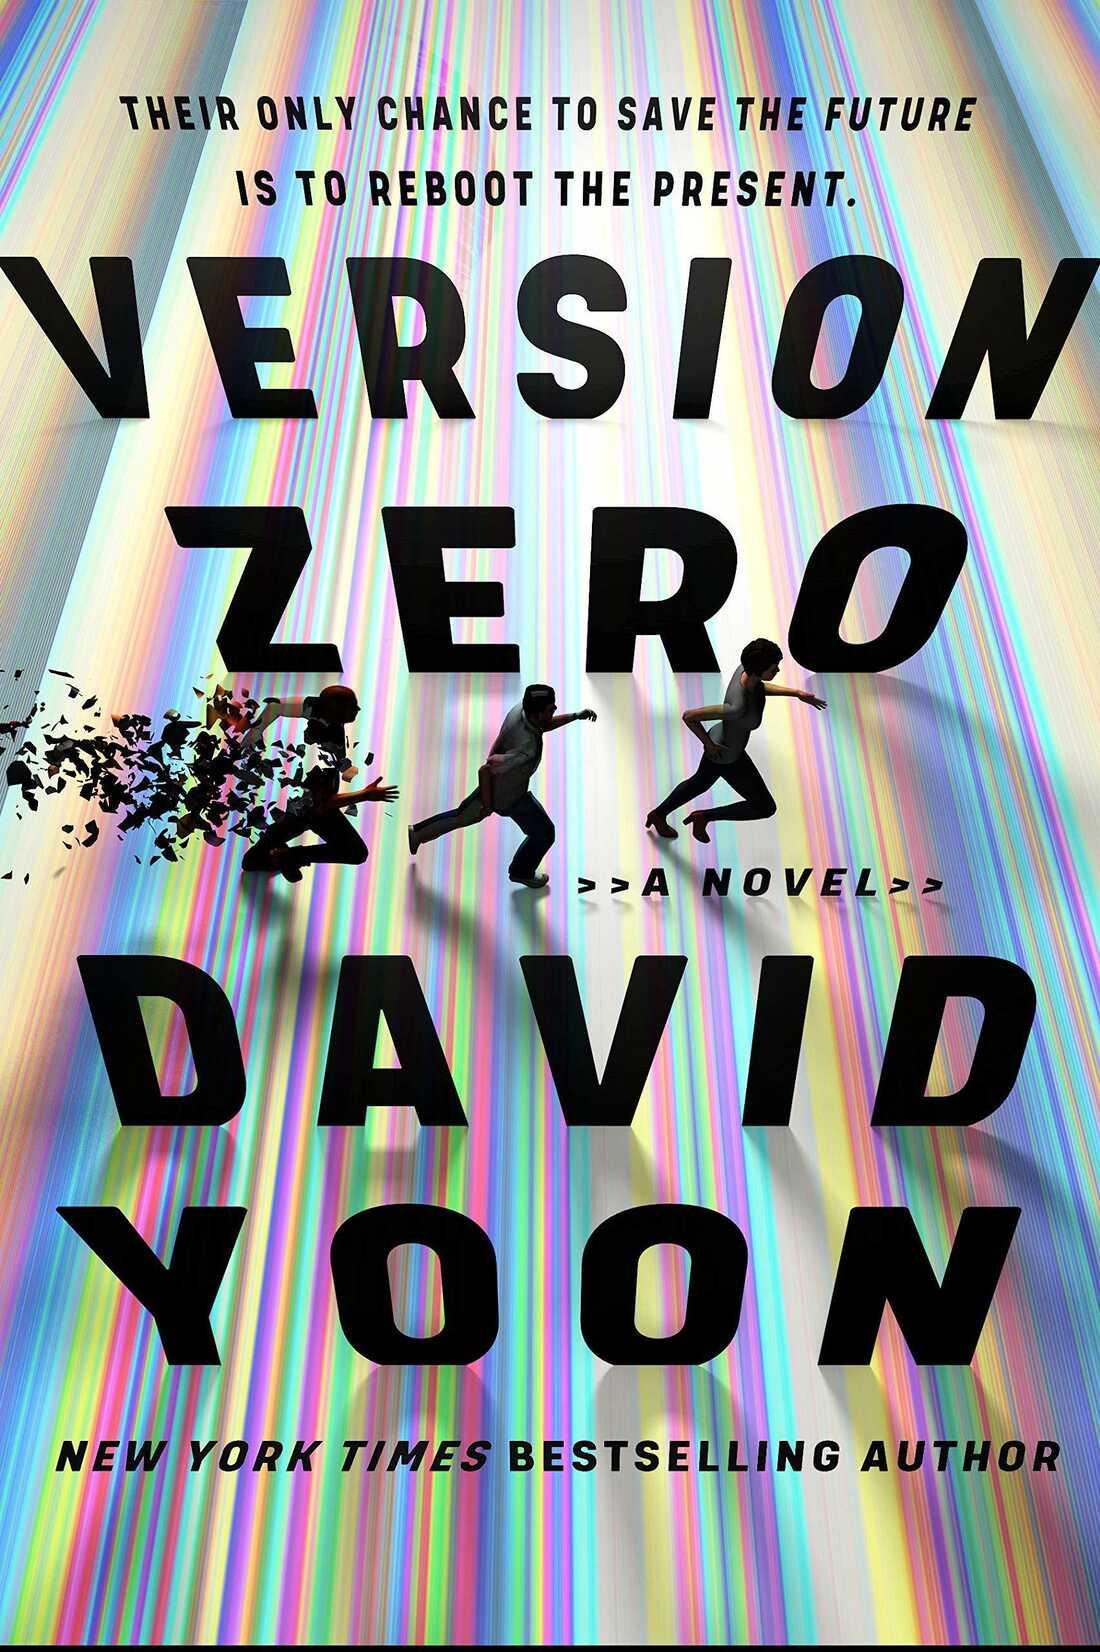 Version Zero, by David Yoon